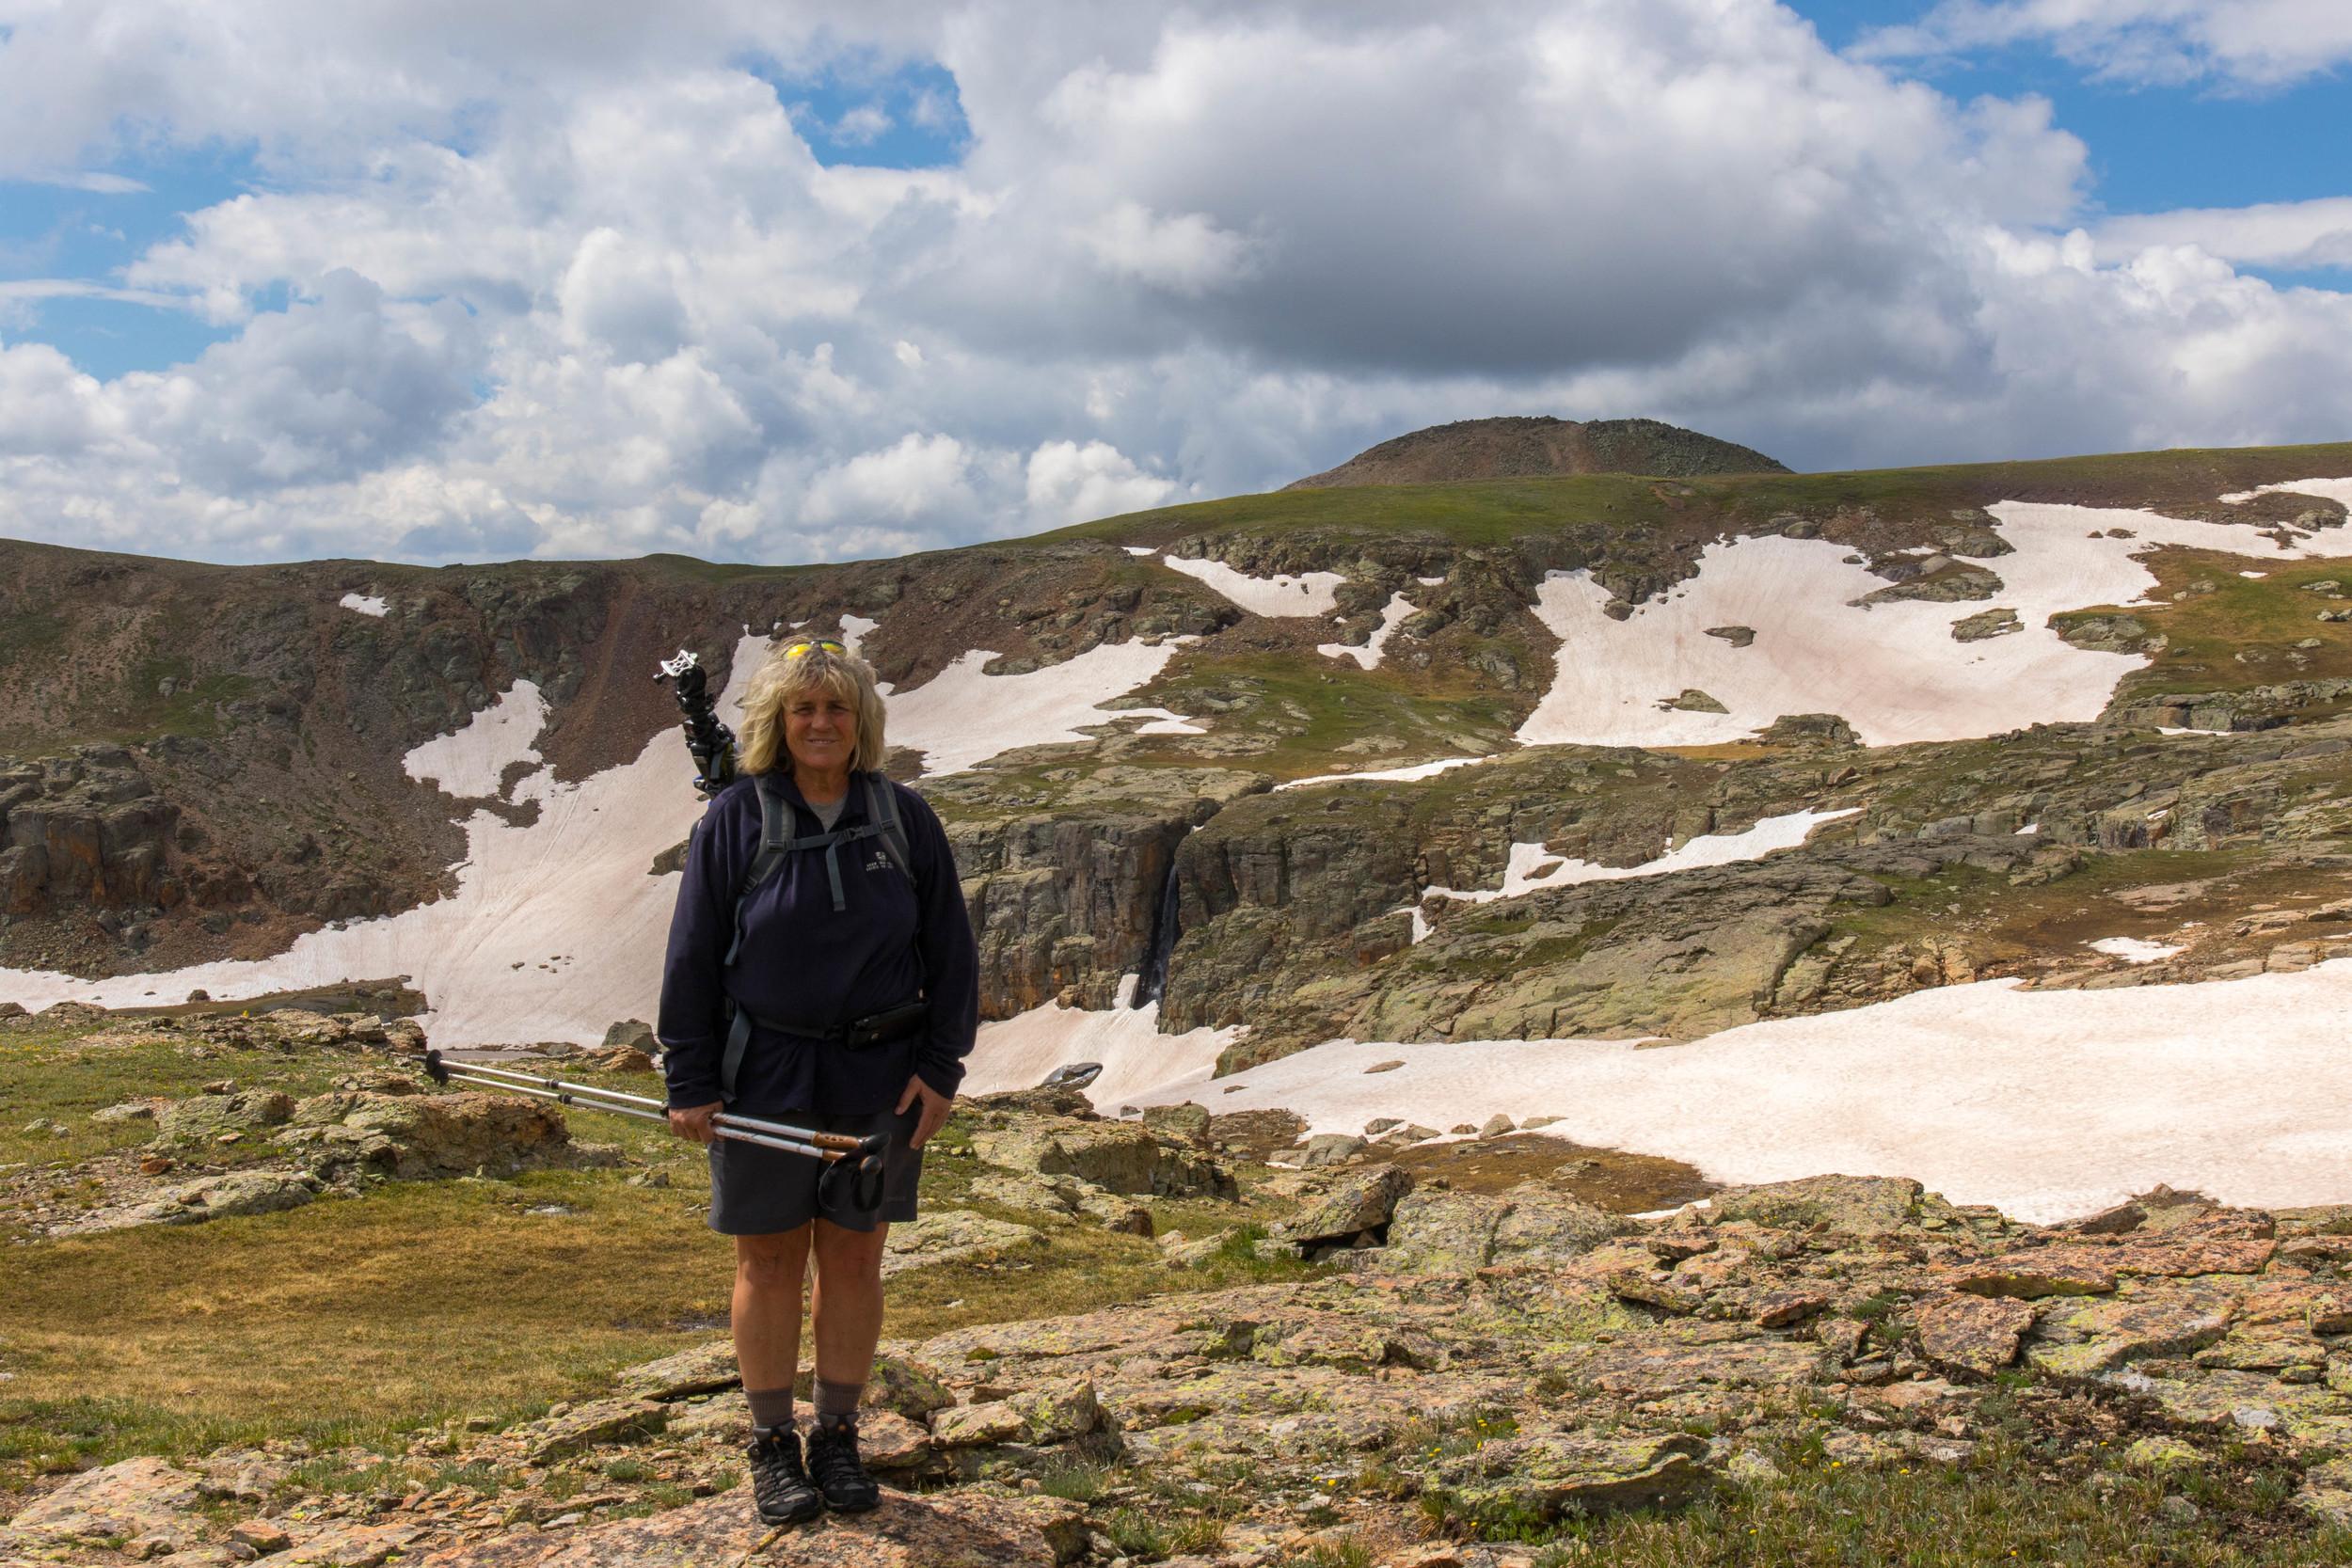 Zarita at Porphyry Basin, Image #JS_5615